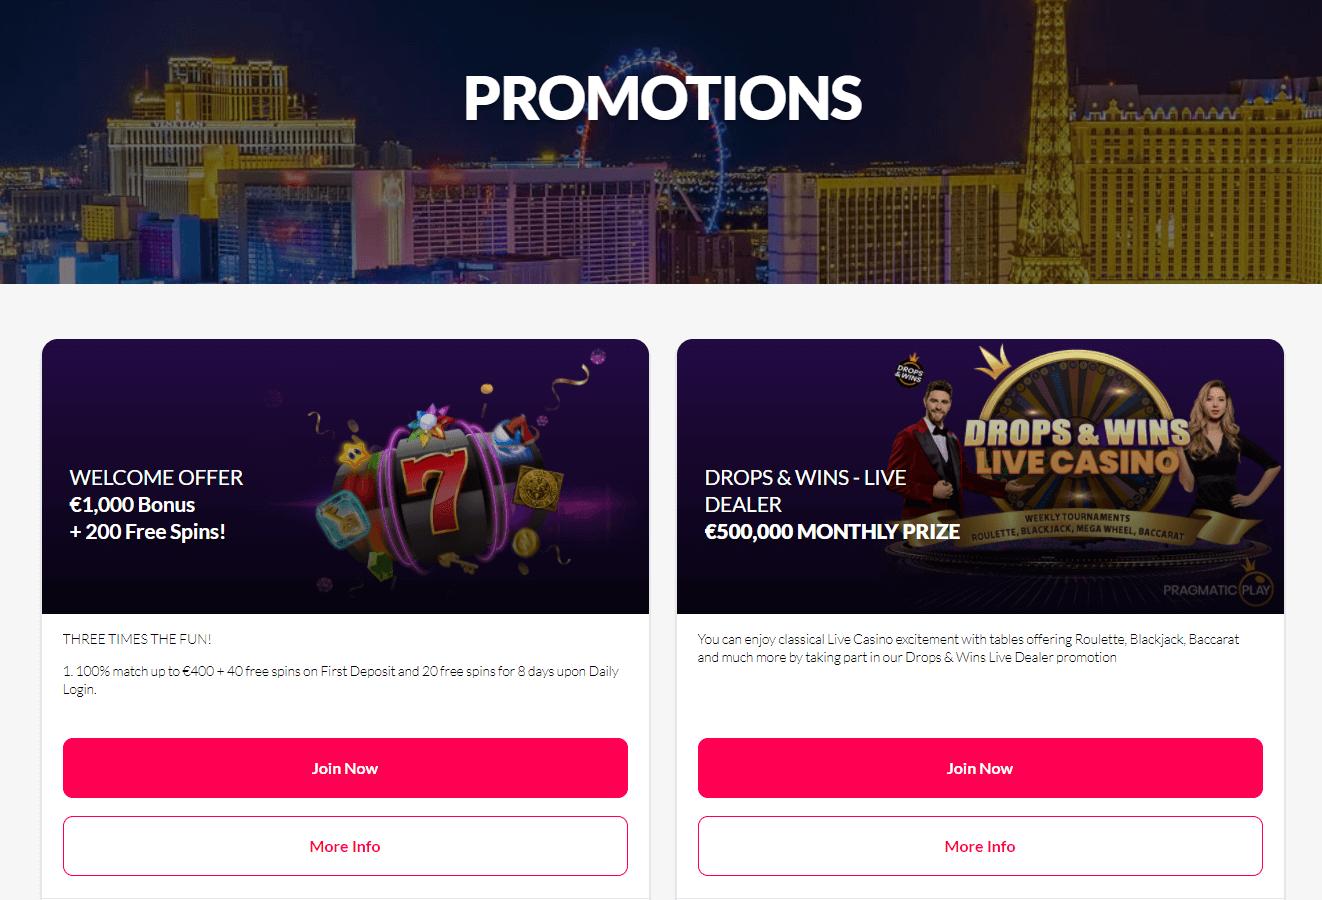 Vegas Kings Casino Promotions